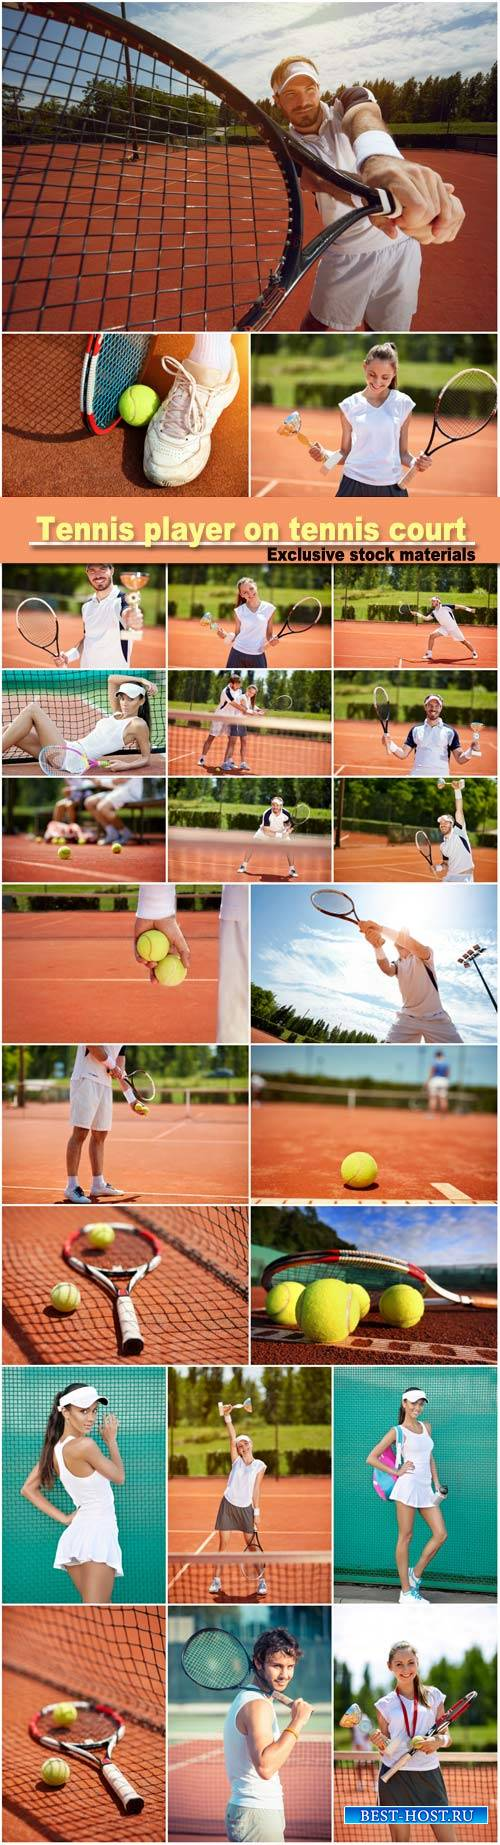 Tennis player on tennis court